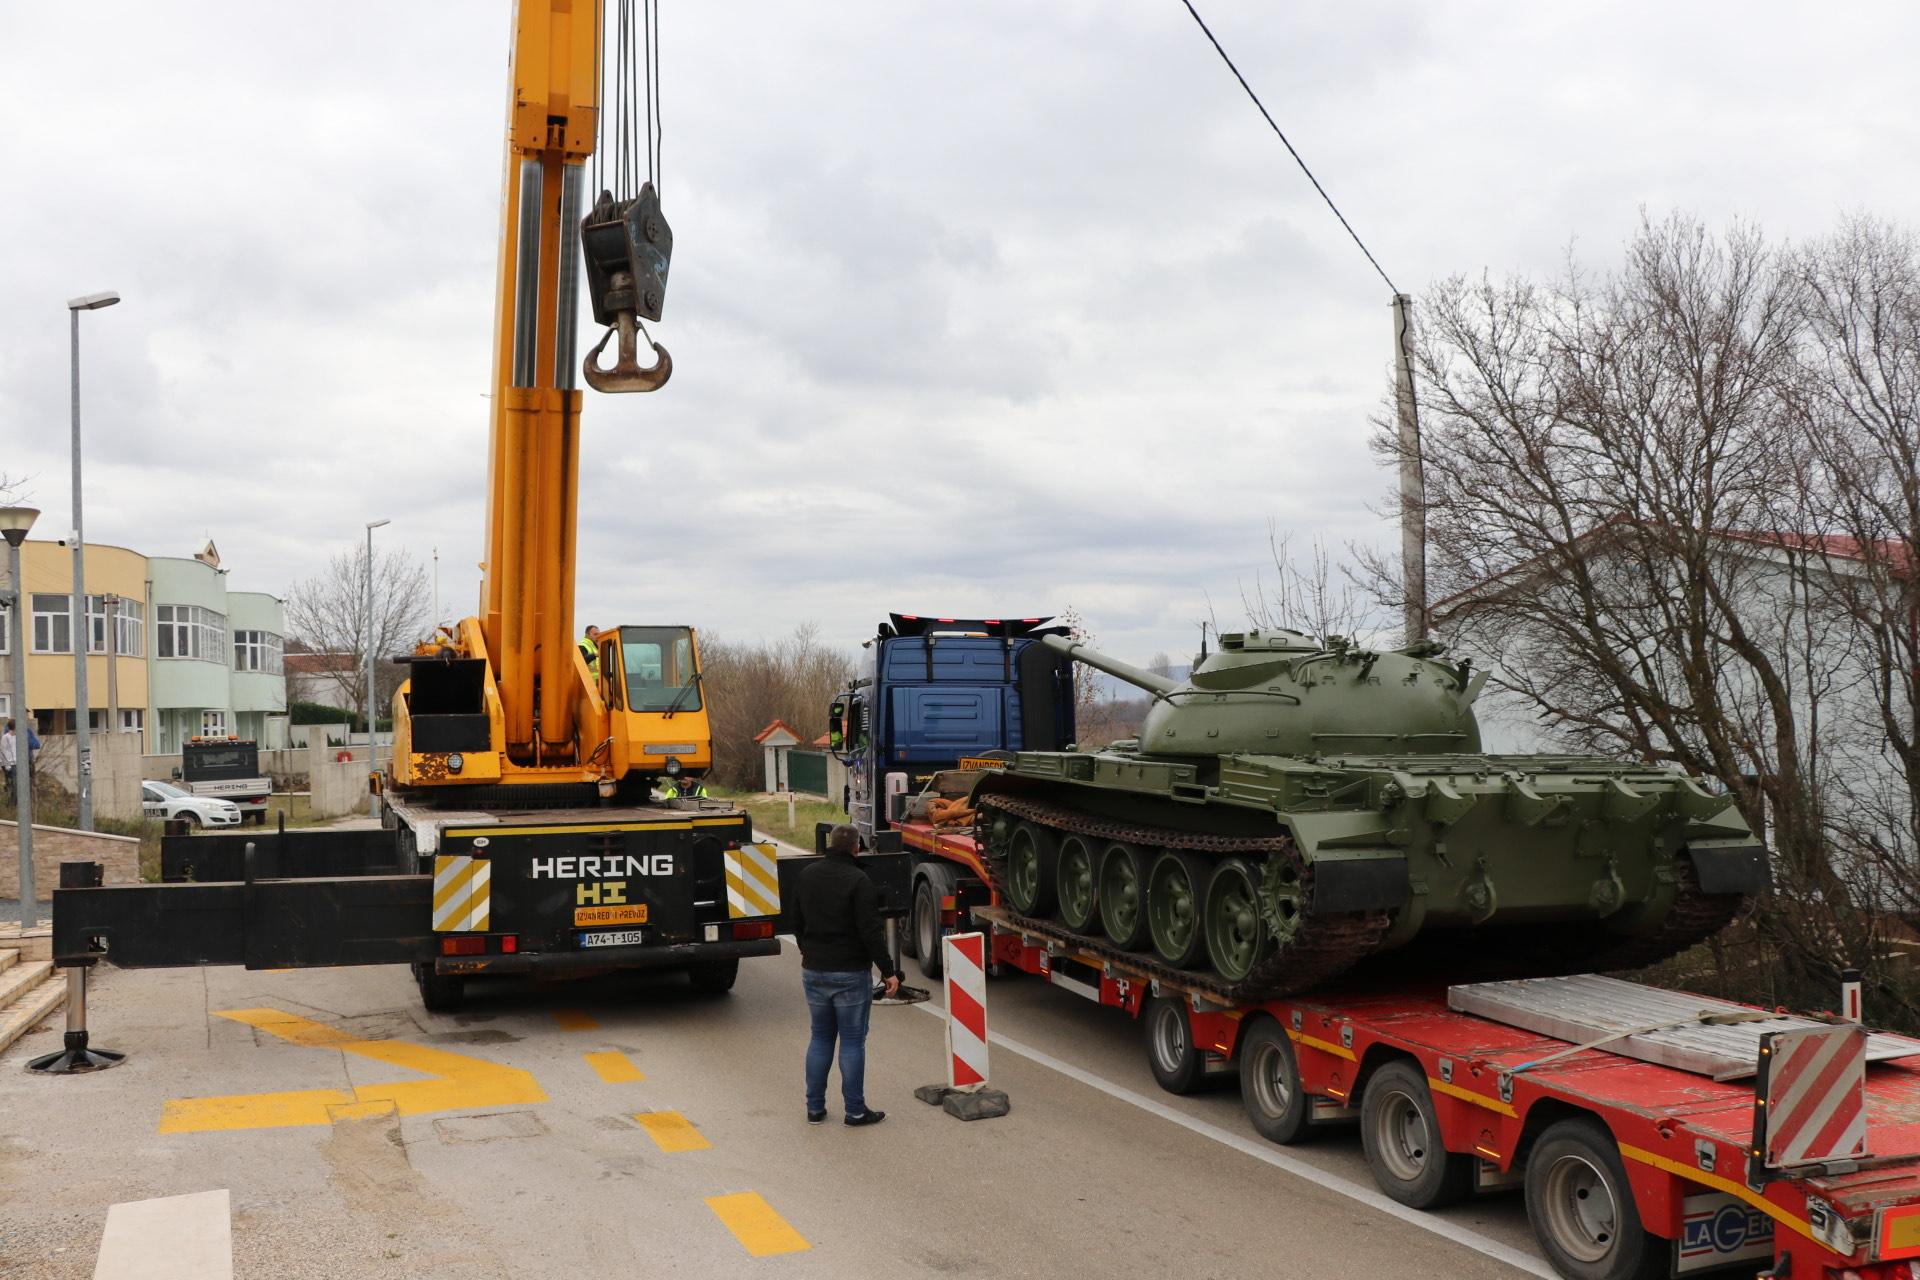 Postavljen tenk na spomen obilježju zaustavljanja tenkova Široki Brijeg – Polog